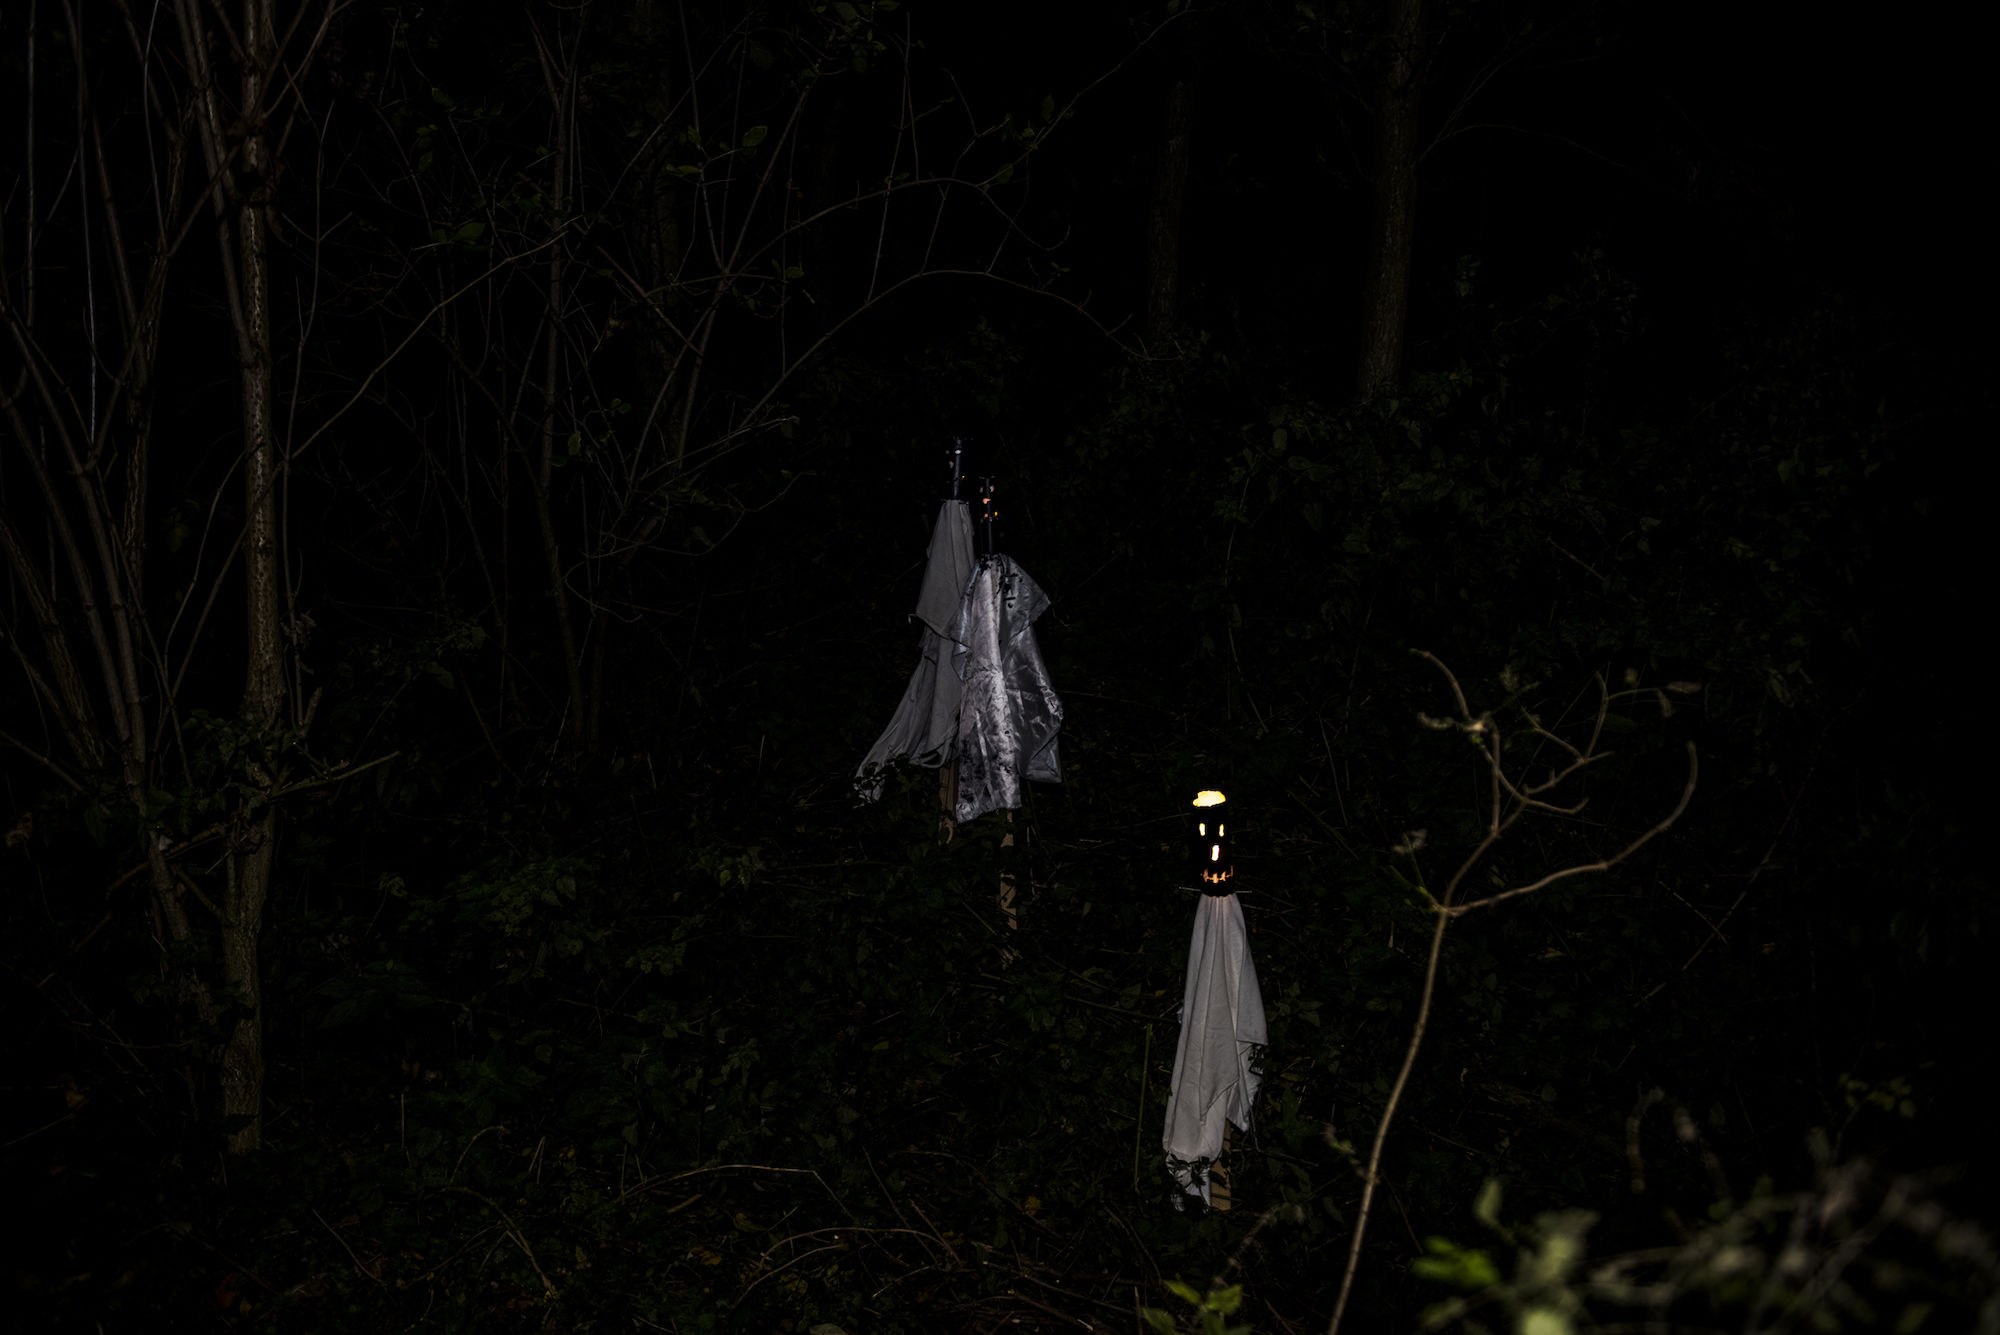 171029-Puyenbroeck-halloween-00267.jpg